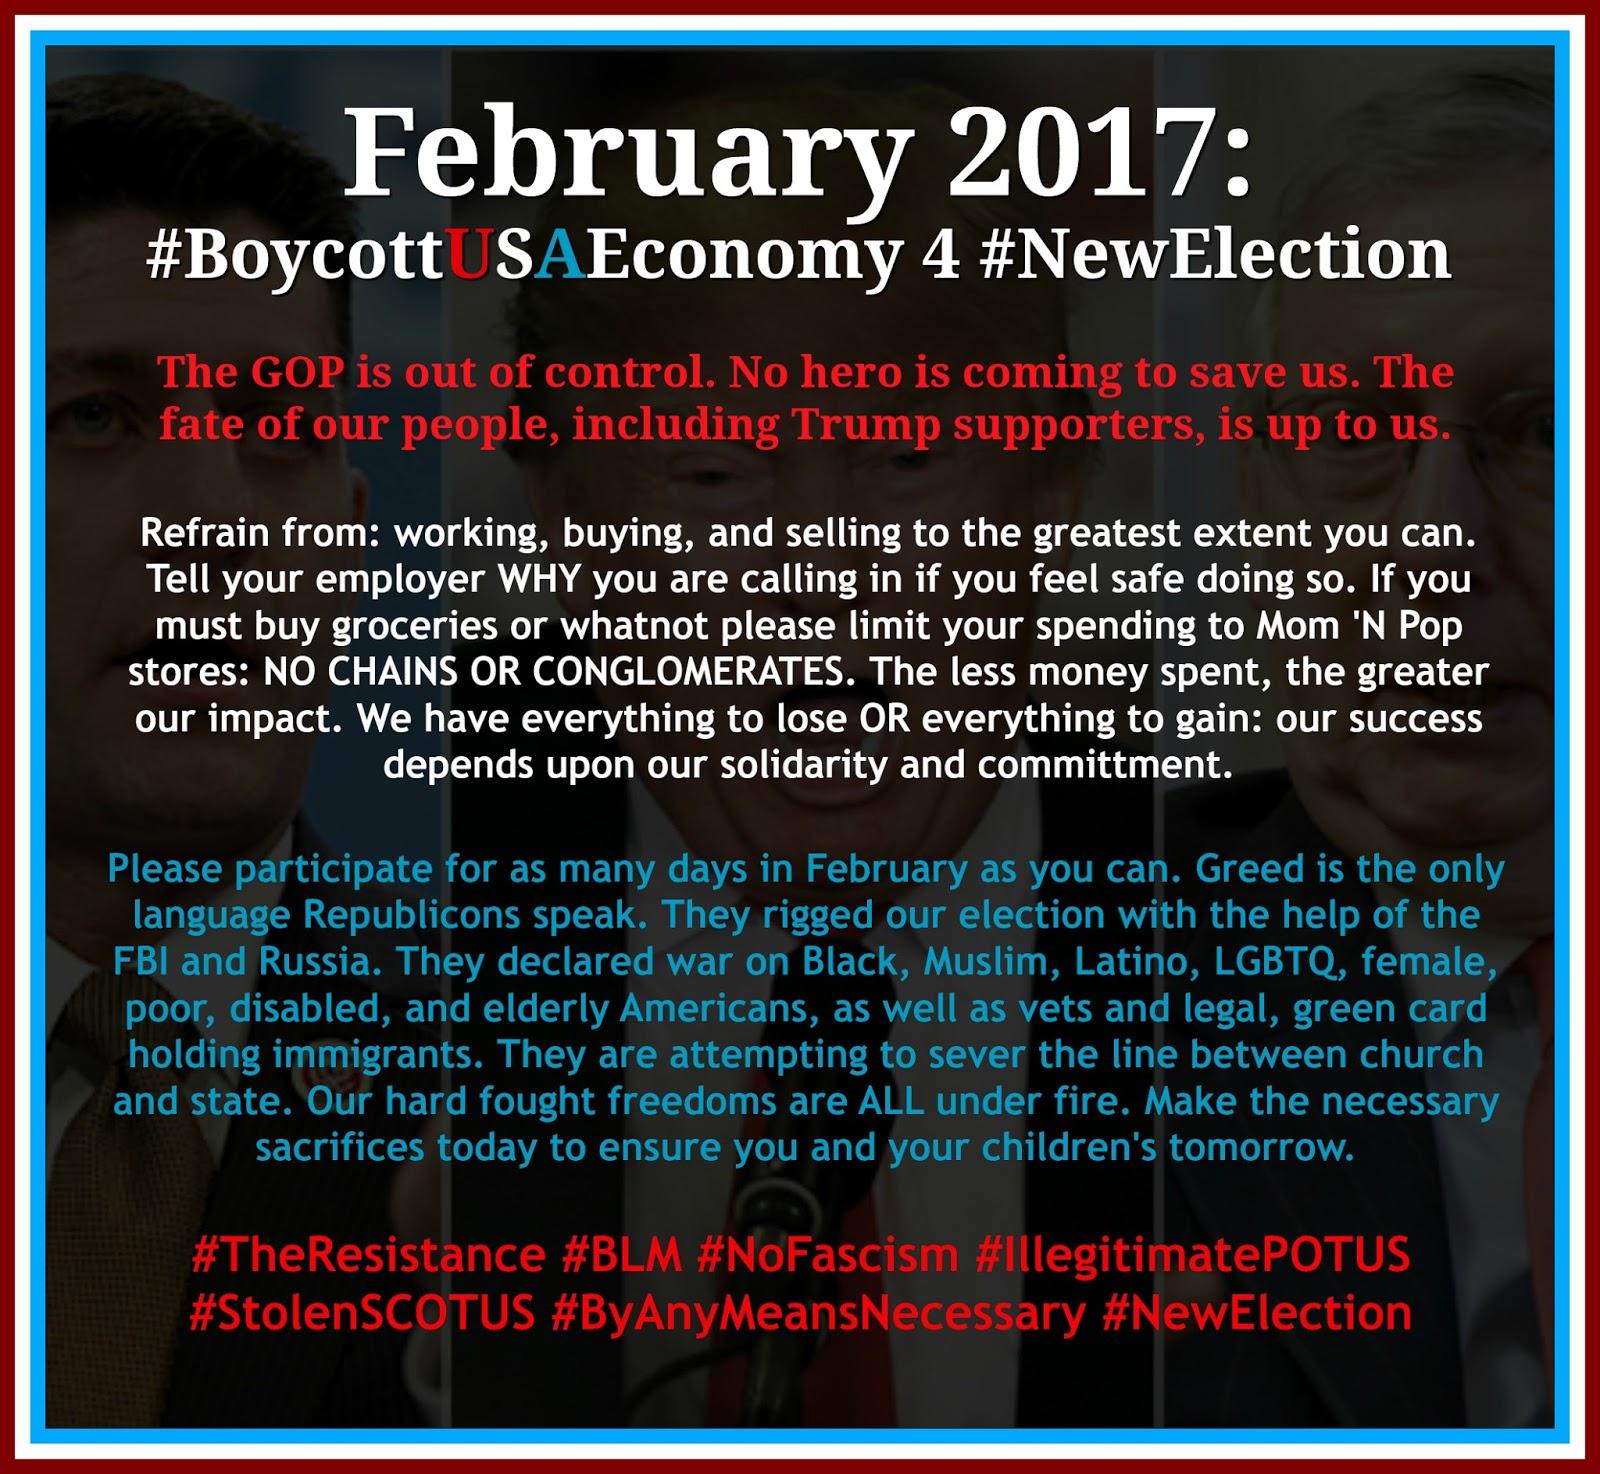 boycott the us economy